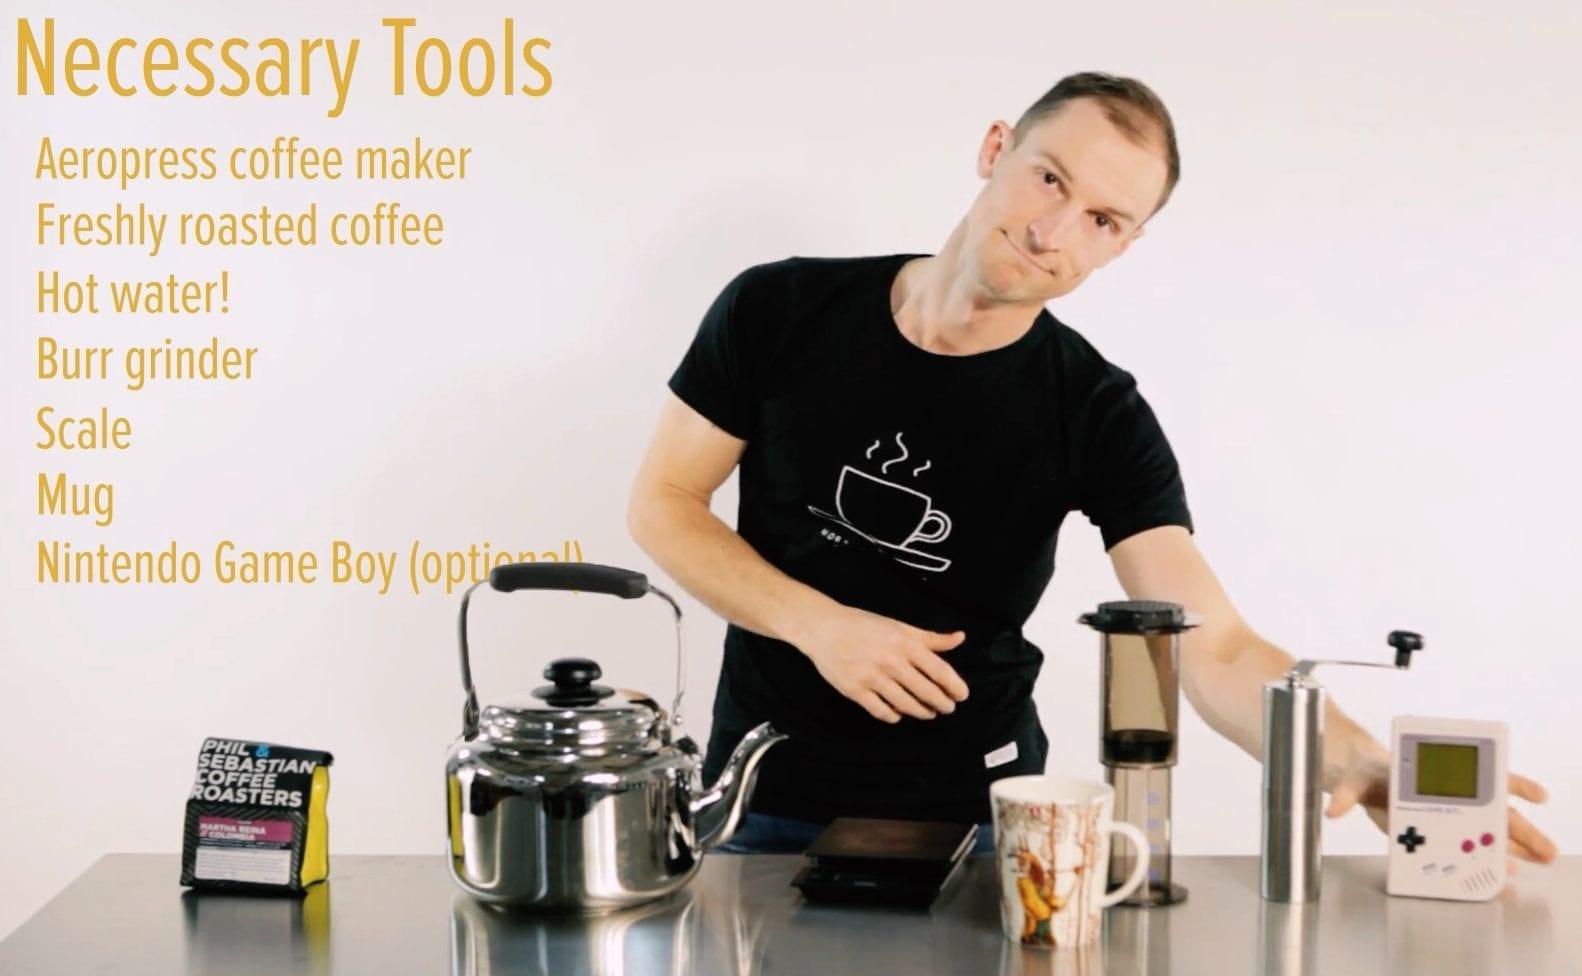 funny man brewing aeropress coffee with kit